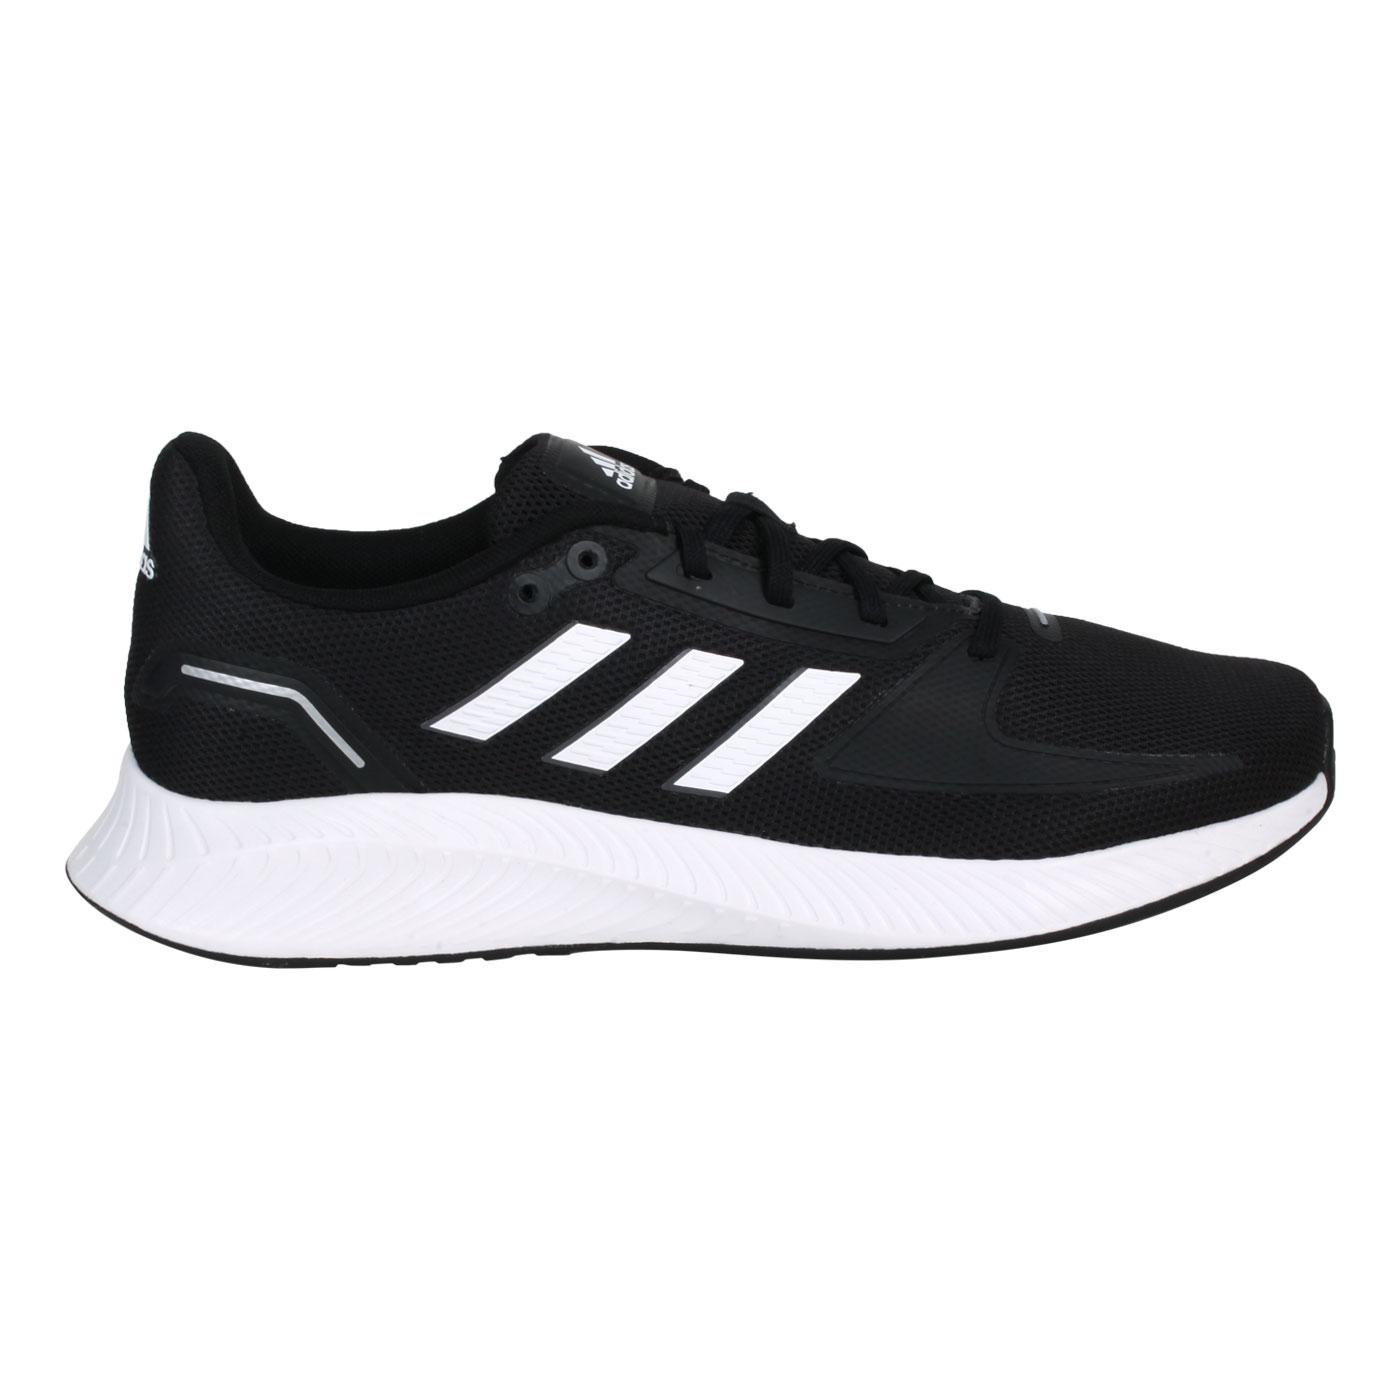 ADIDAS 男款休閒慢跑鞋  @RUNFALCON 2.0@FY5943